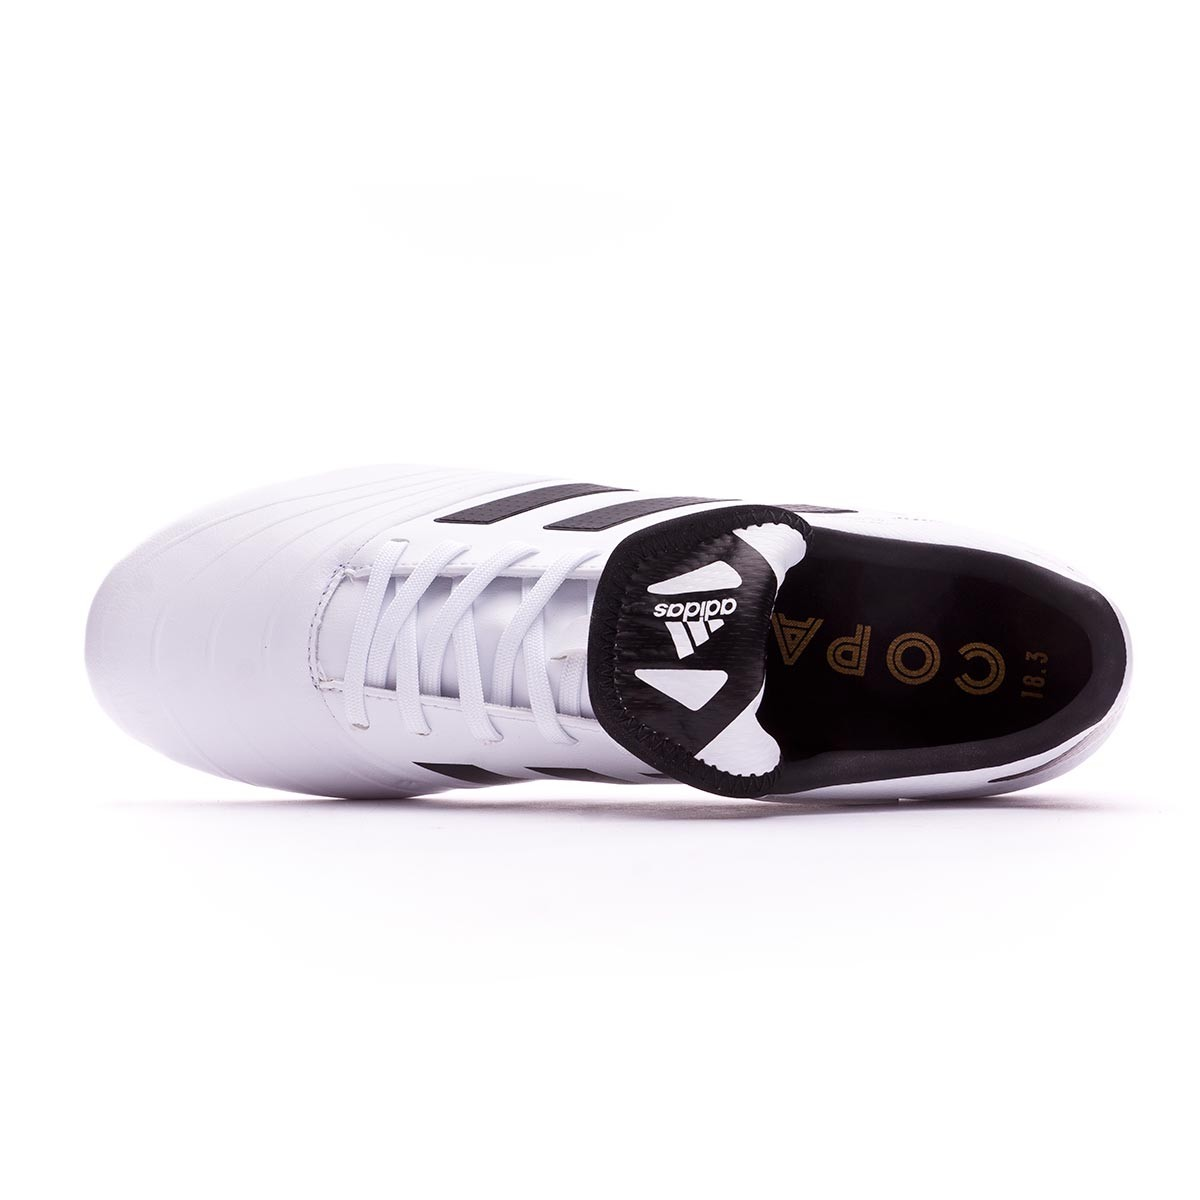 43d068c76 Football Boots adidas Copa 18.3 FG White-Core black-Tactile gold metallic -  Football store Fútbol Emotion